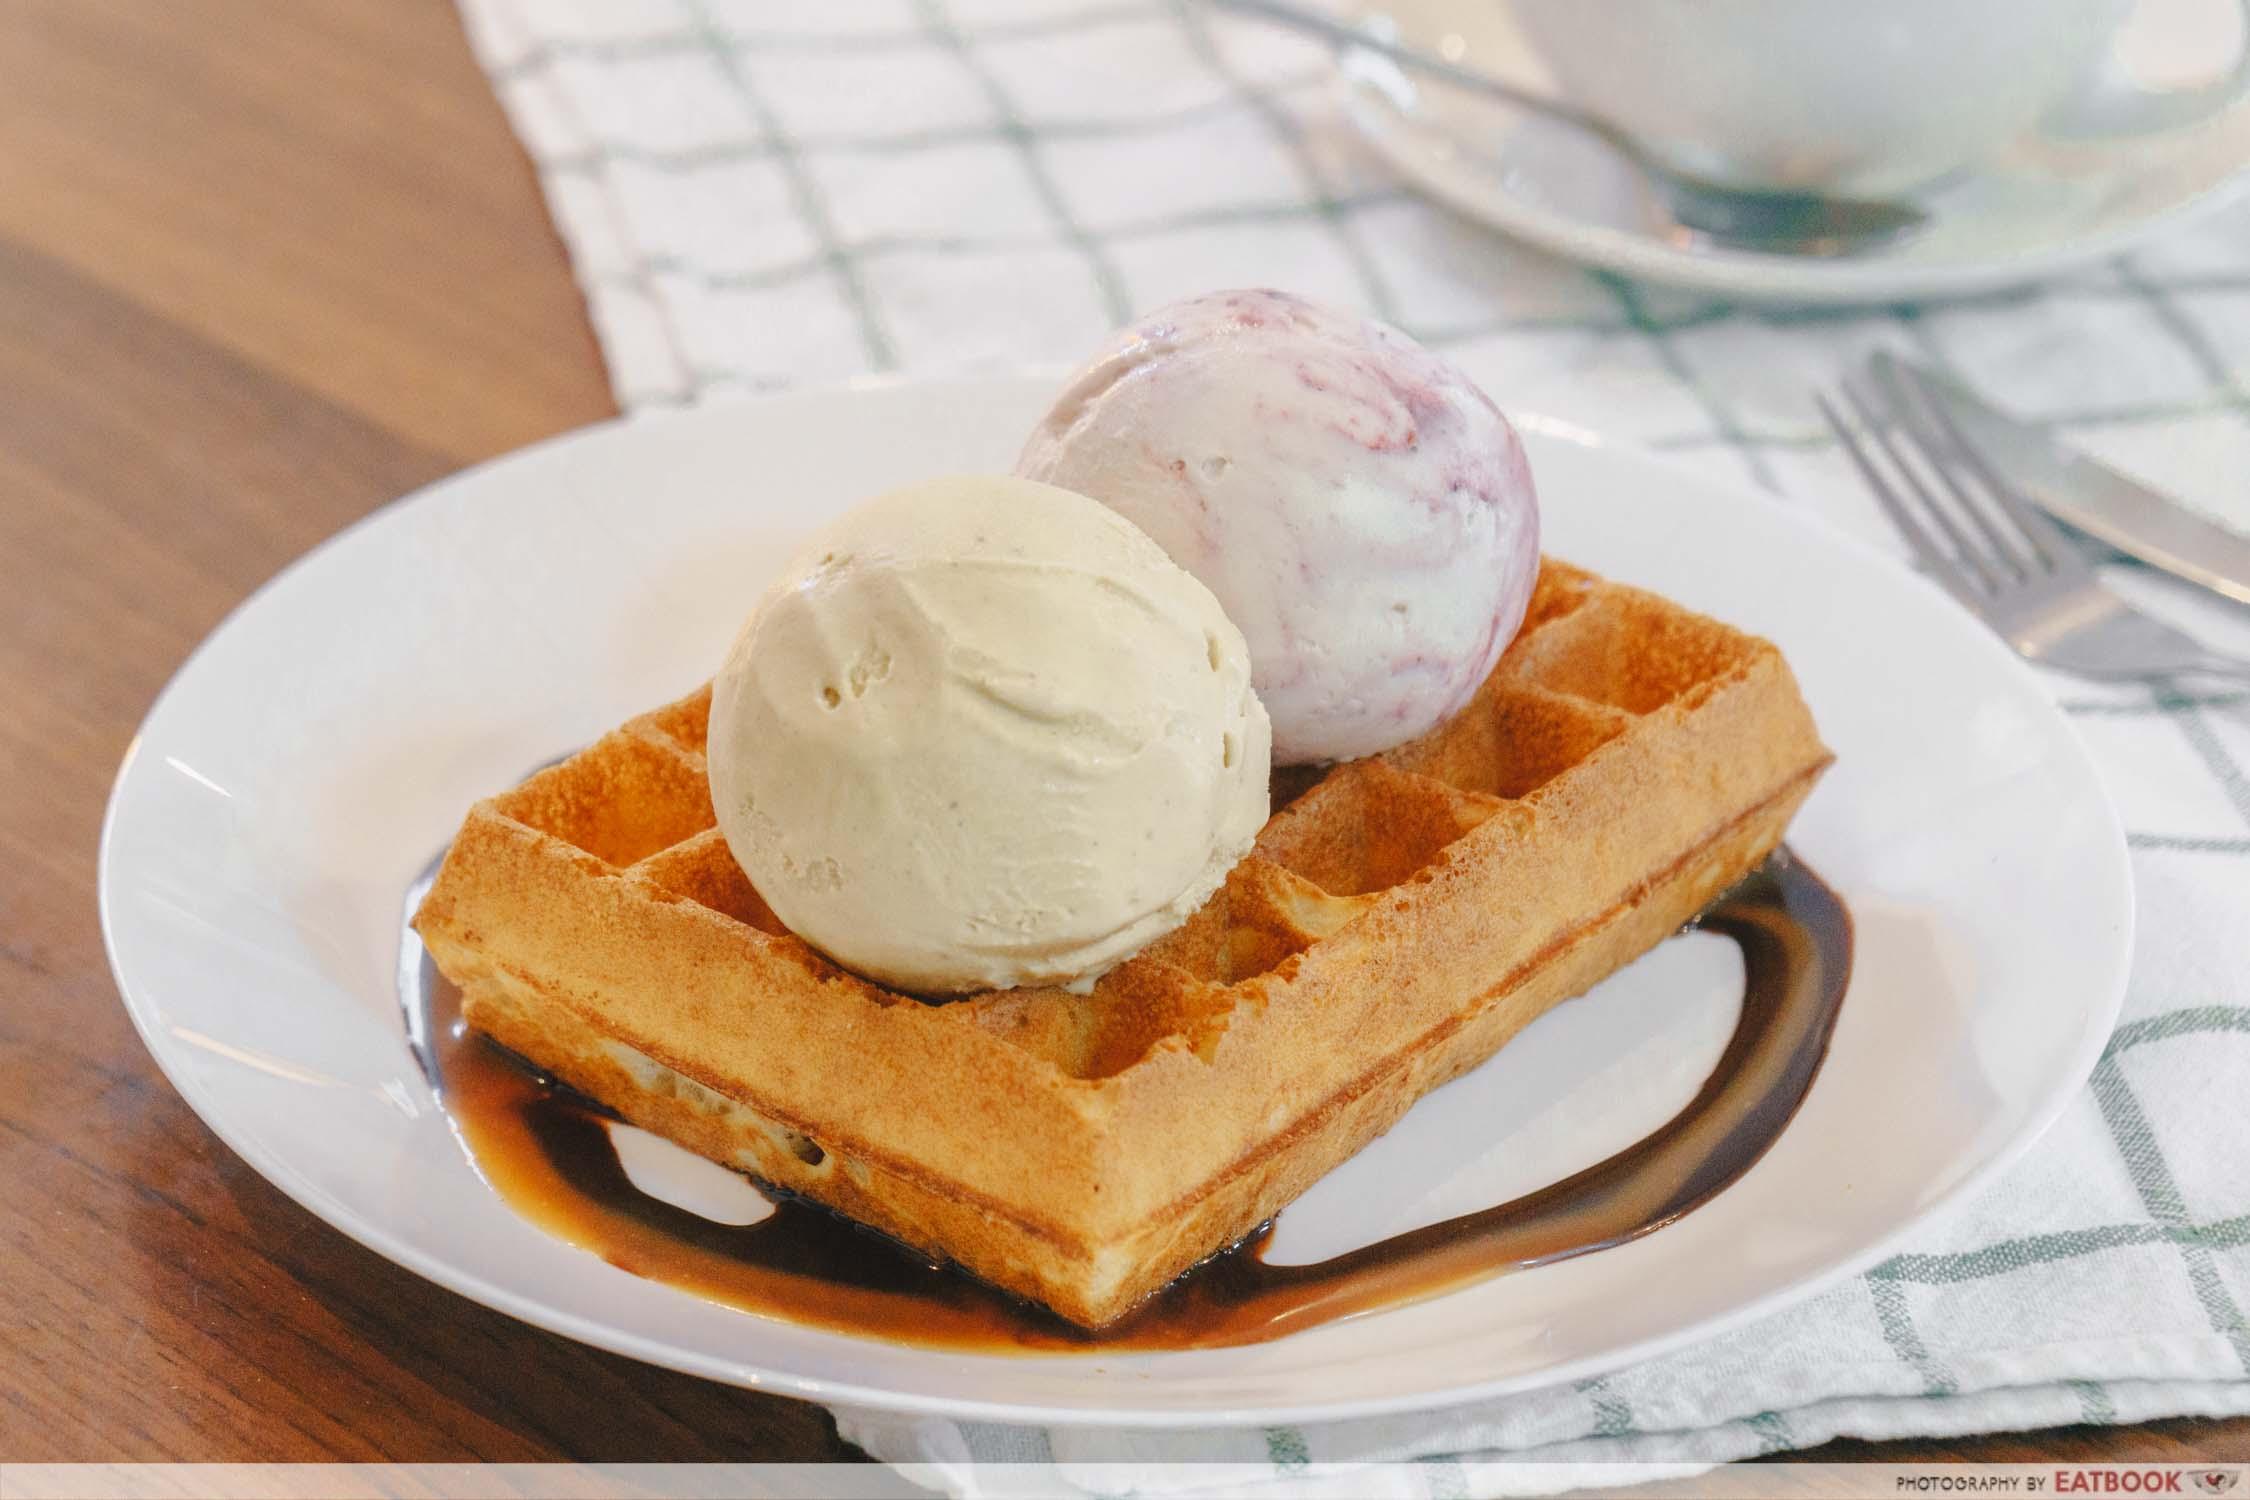 Denzy Gelato - Ice-cream and waffles